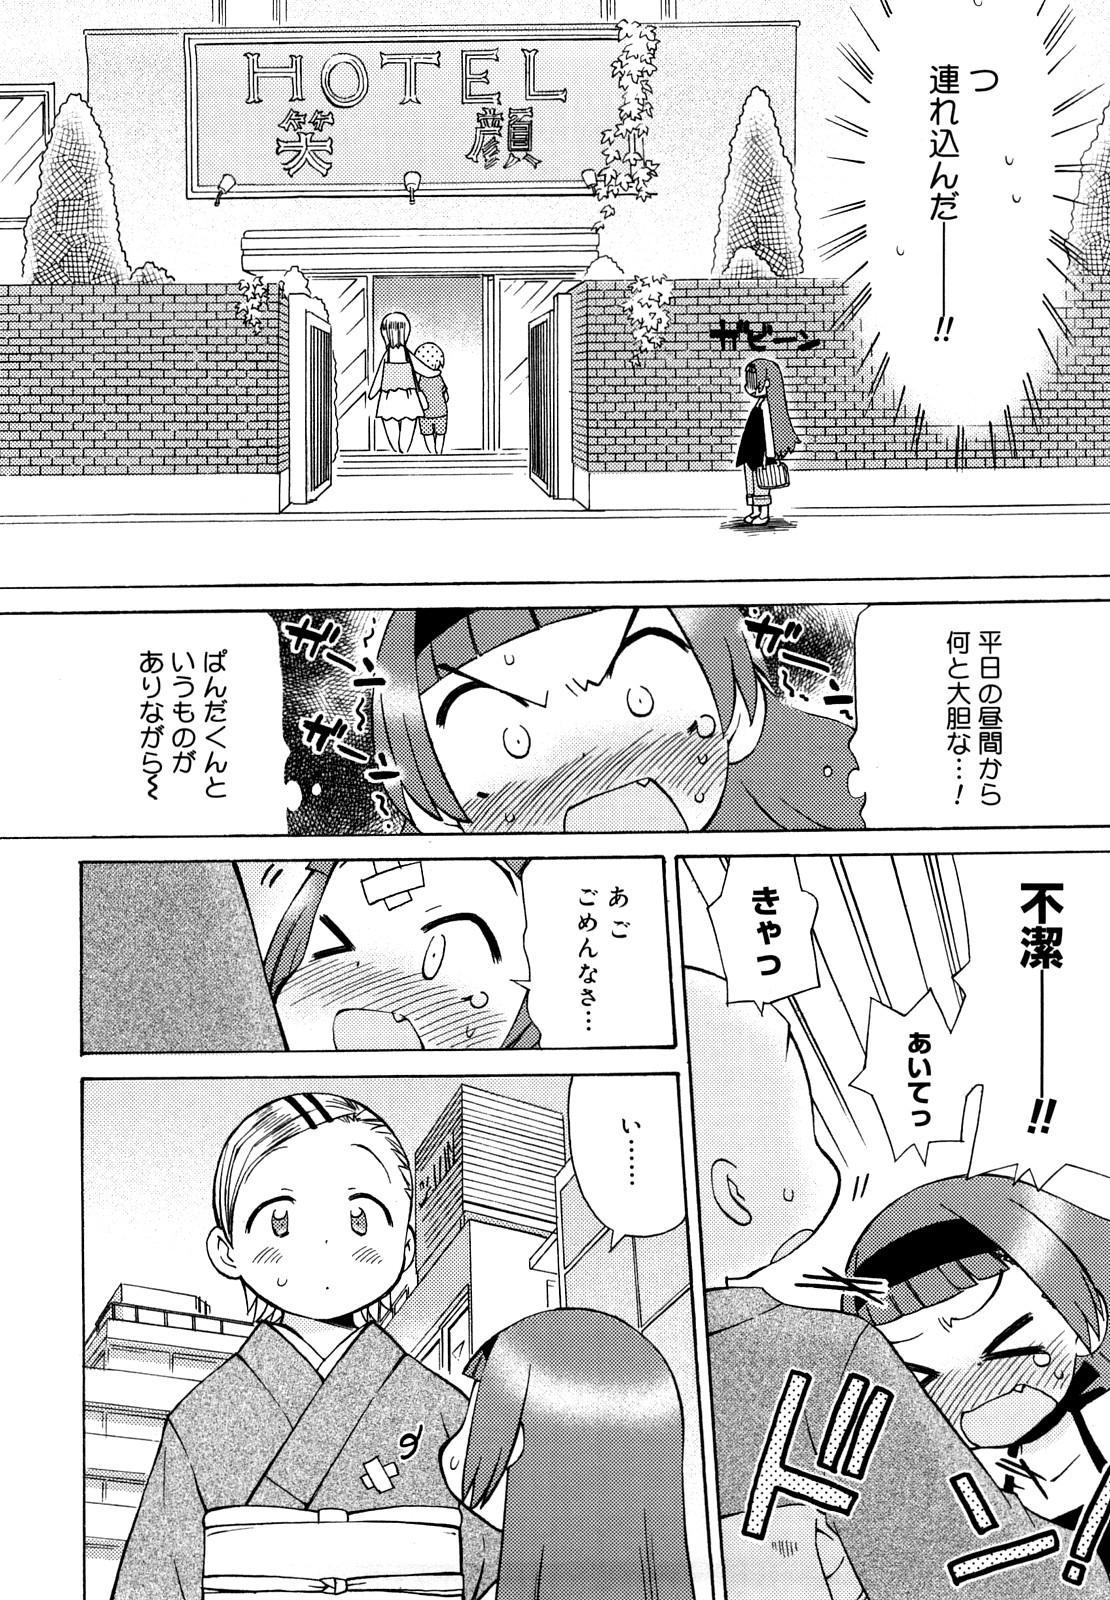 Hatsuden Pandakun! Shinsouban 194